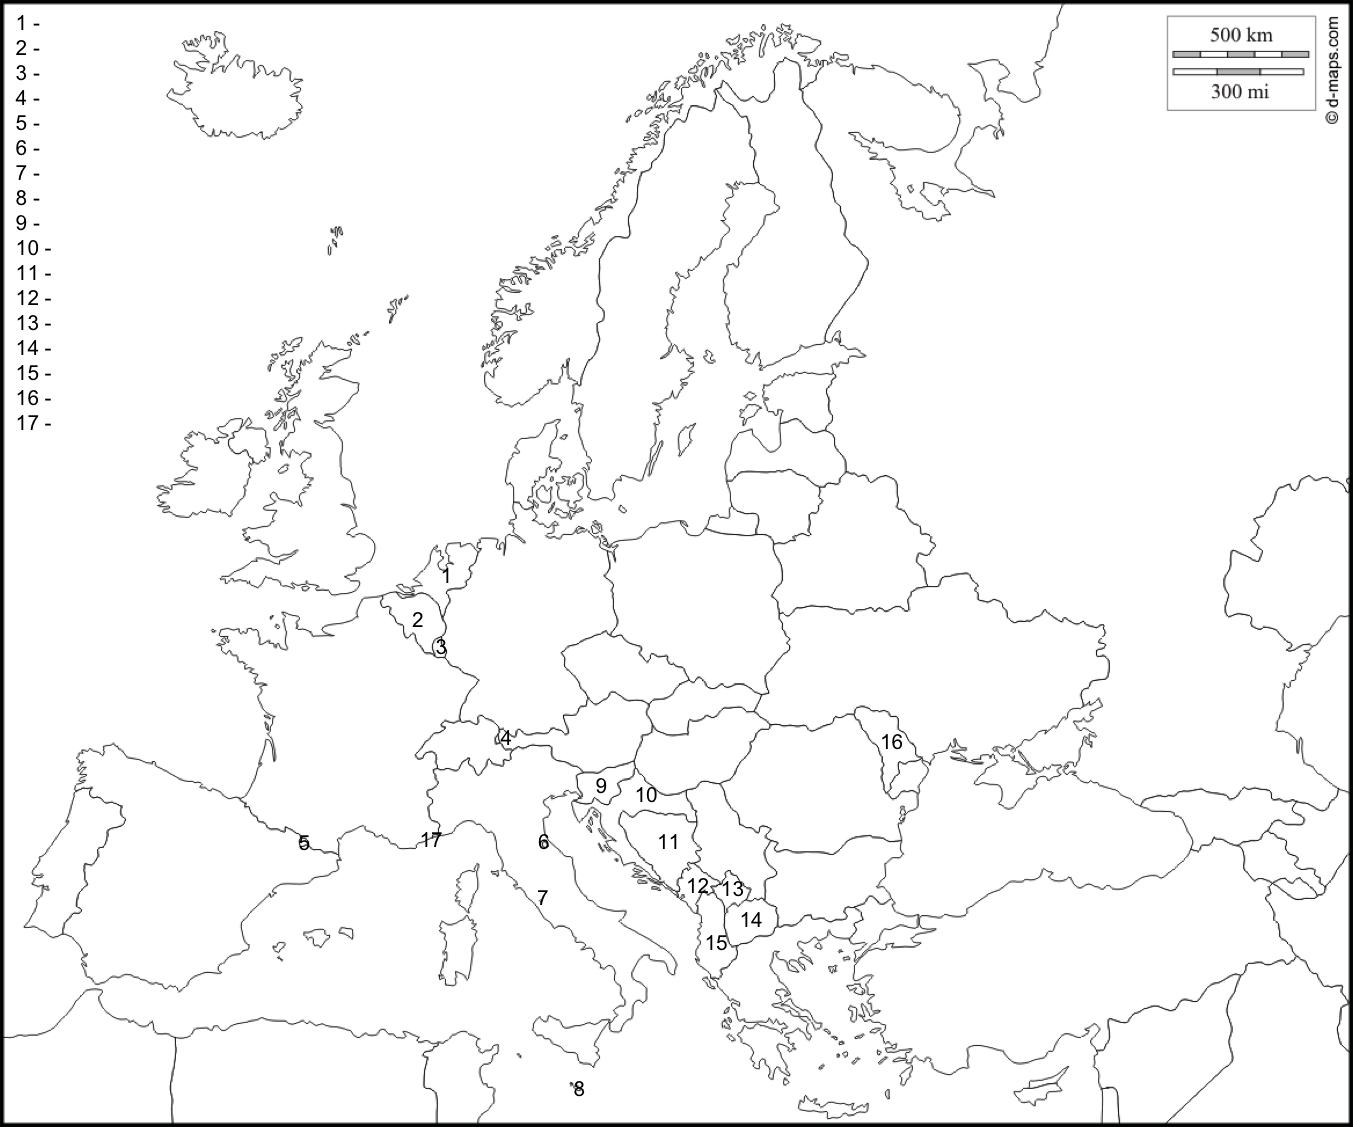 Carte Europe Vierge Png 7 » Png Image concernant Carte De L Europe Vierge